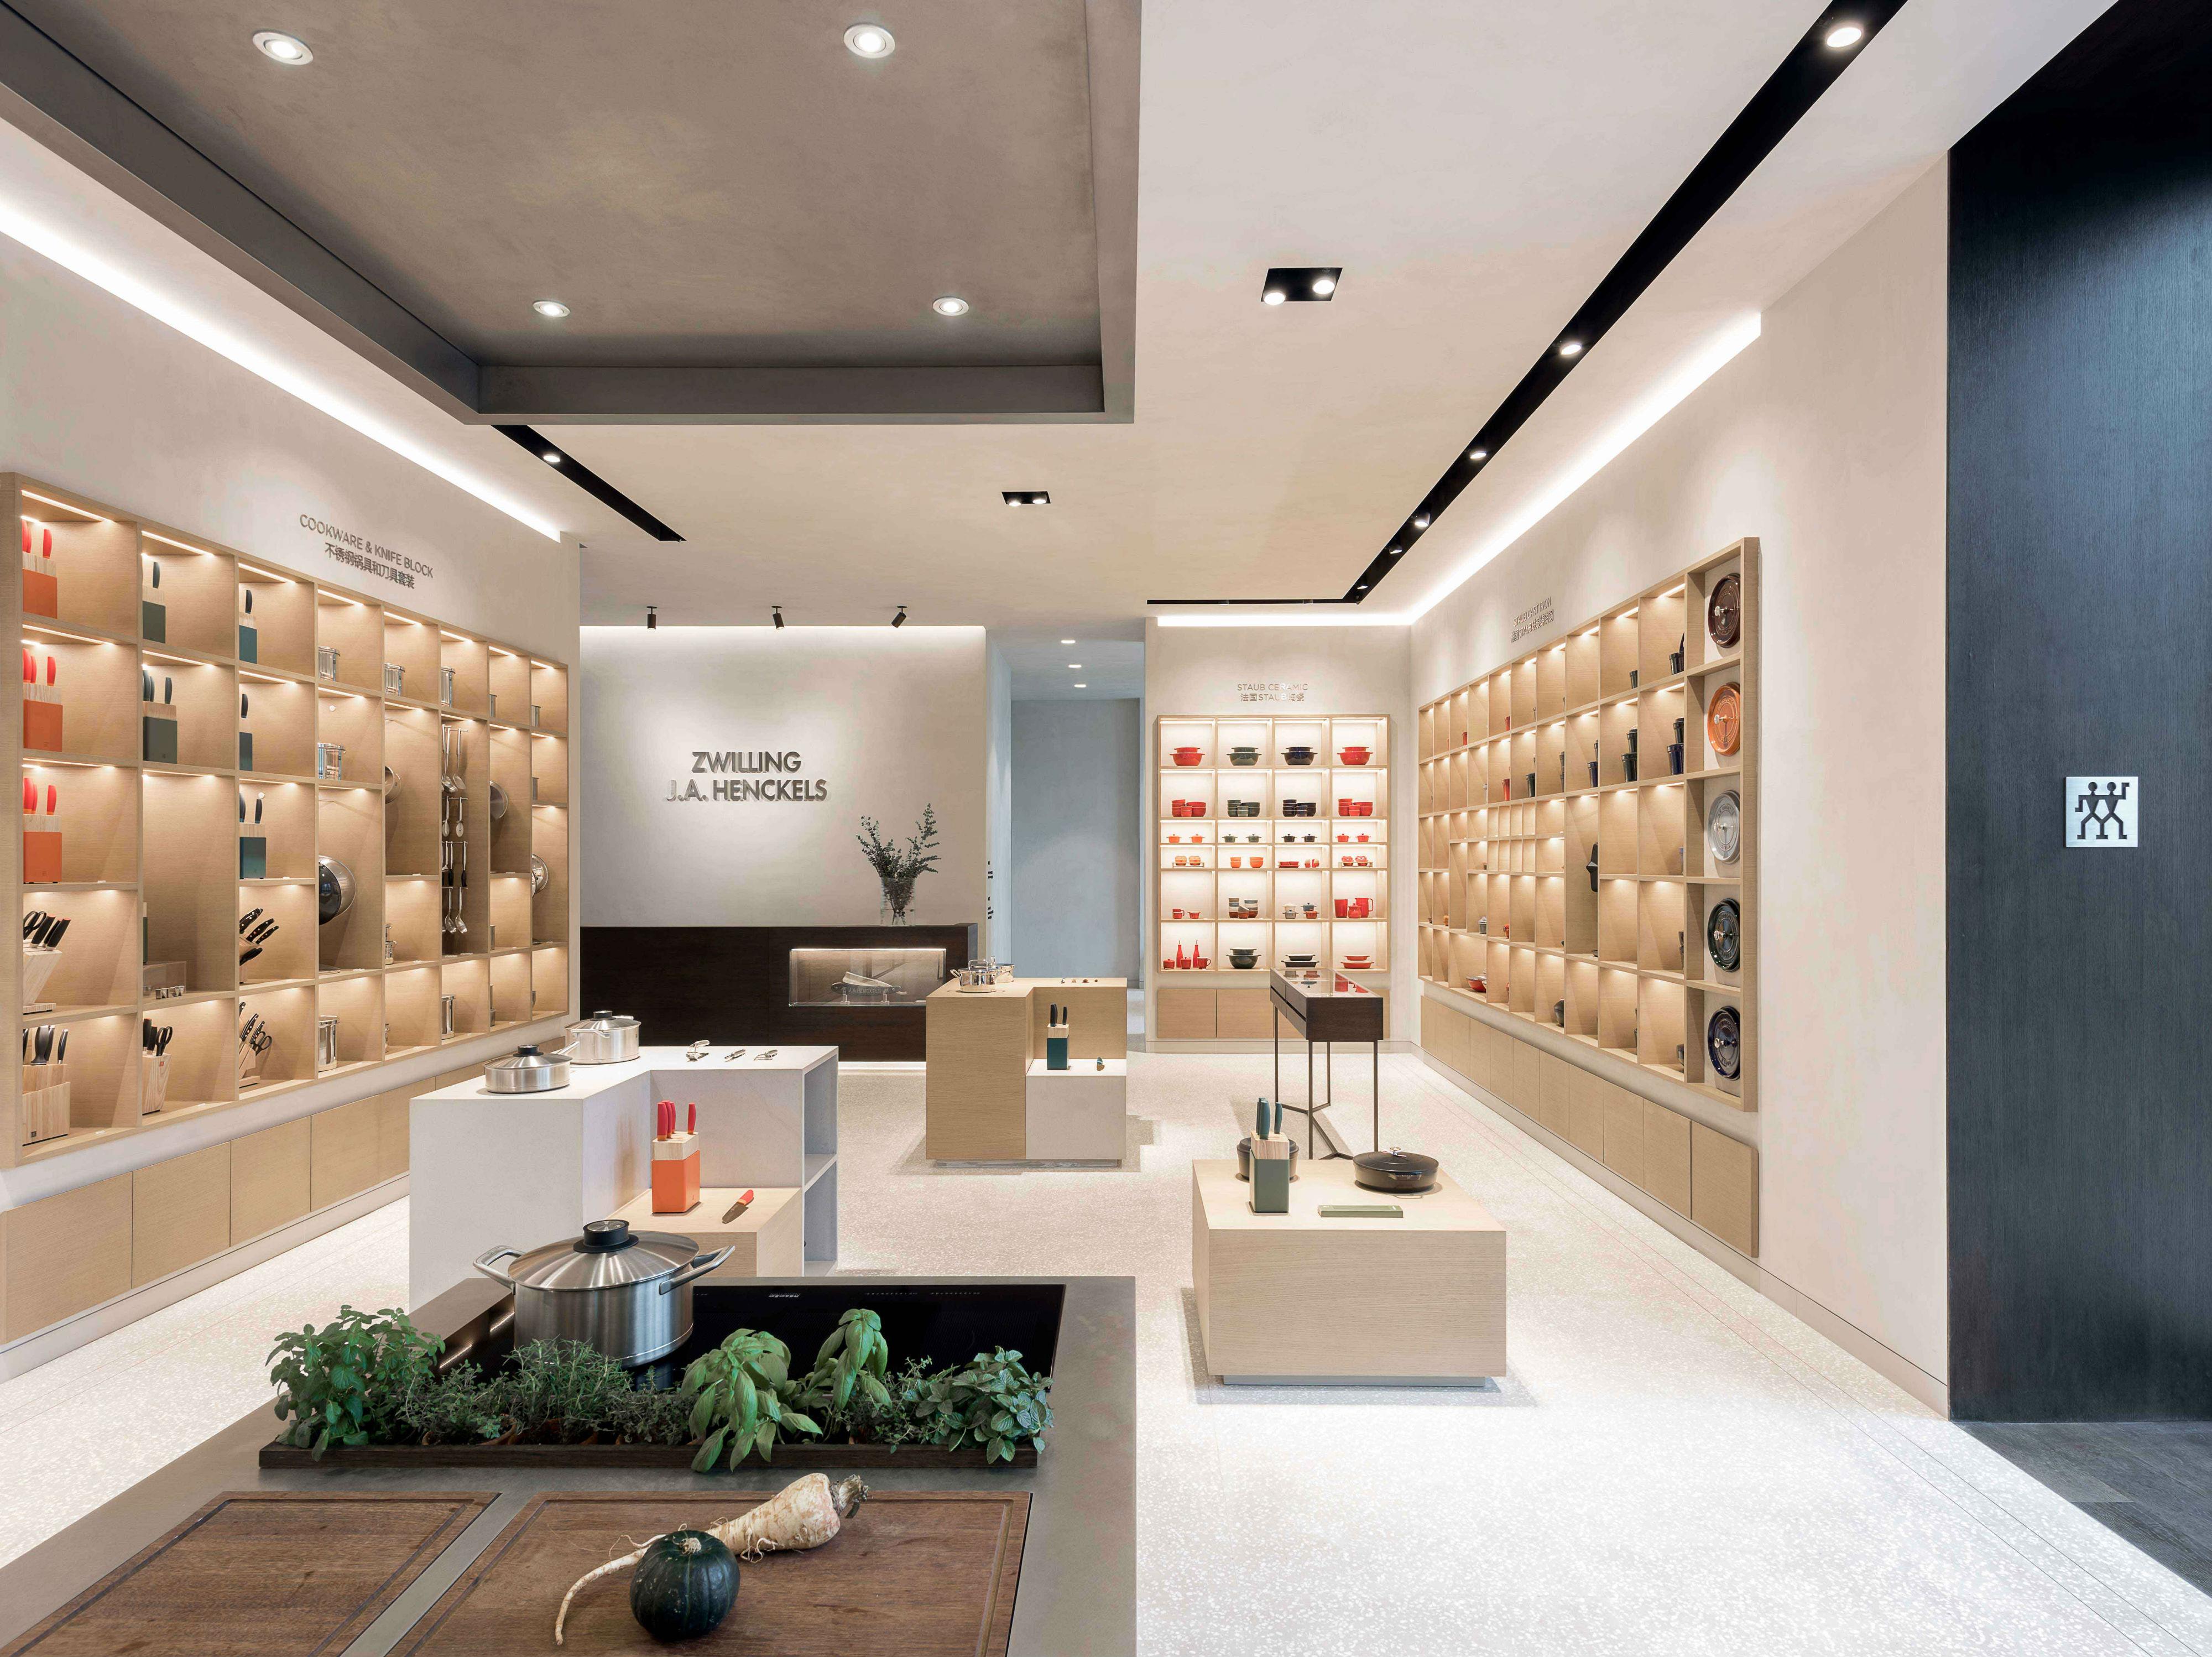 db75c5f070c Matteo Thun + Antonio Rodriguez design ZWILLING s Chinese flagship store